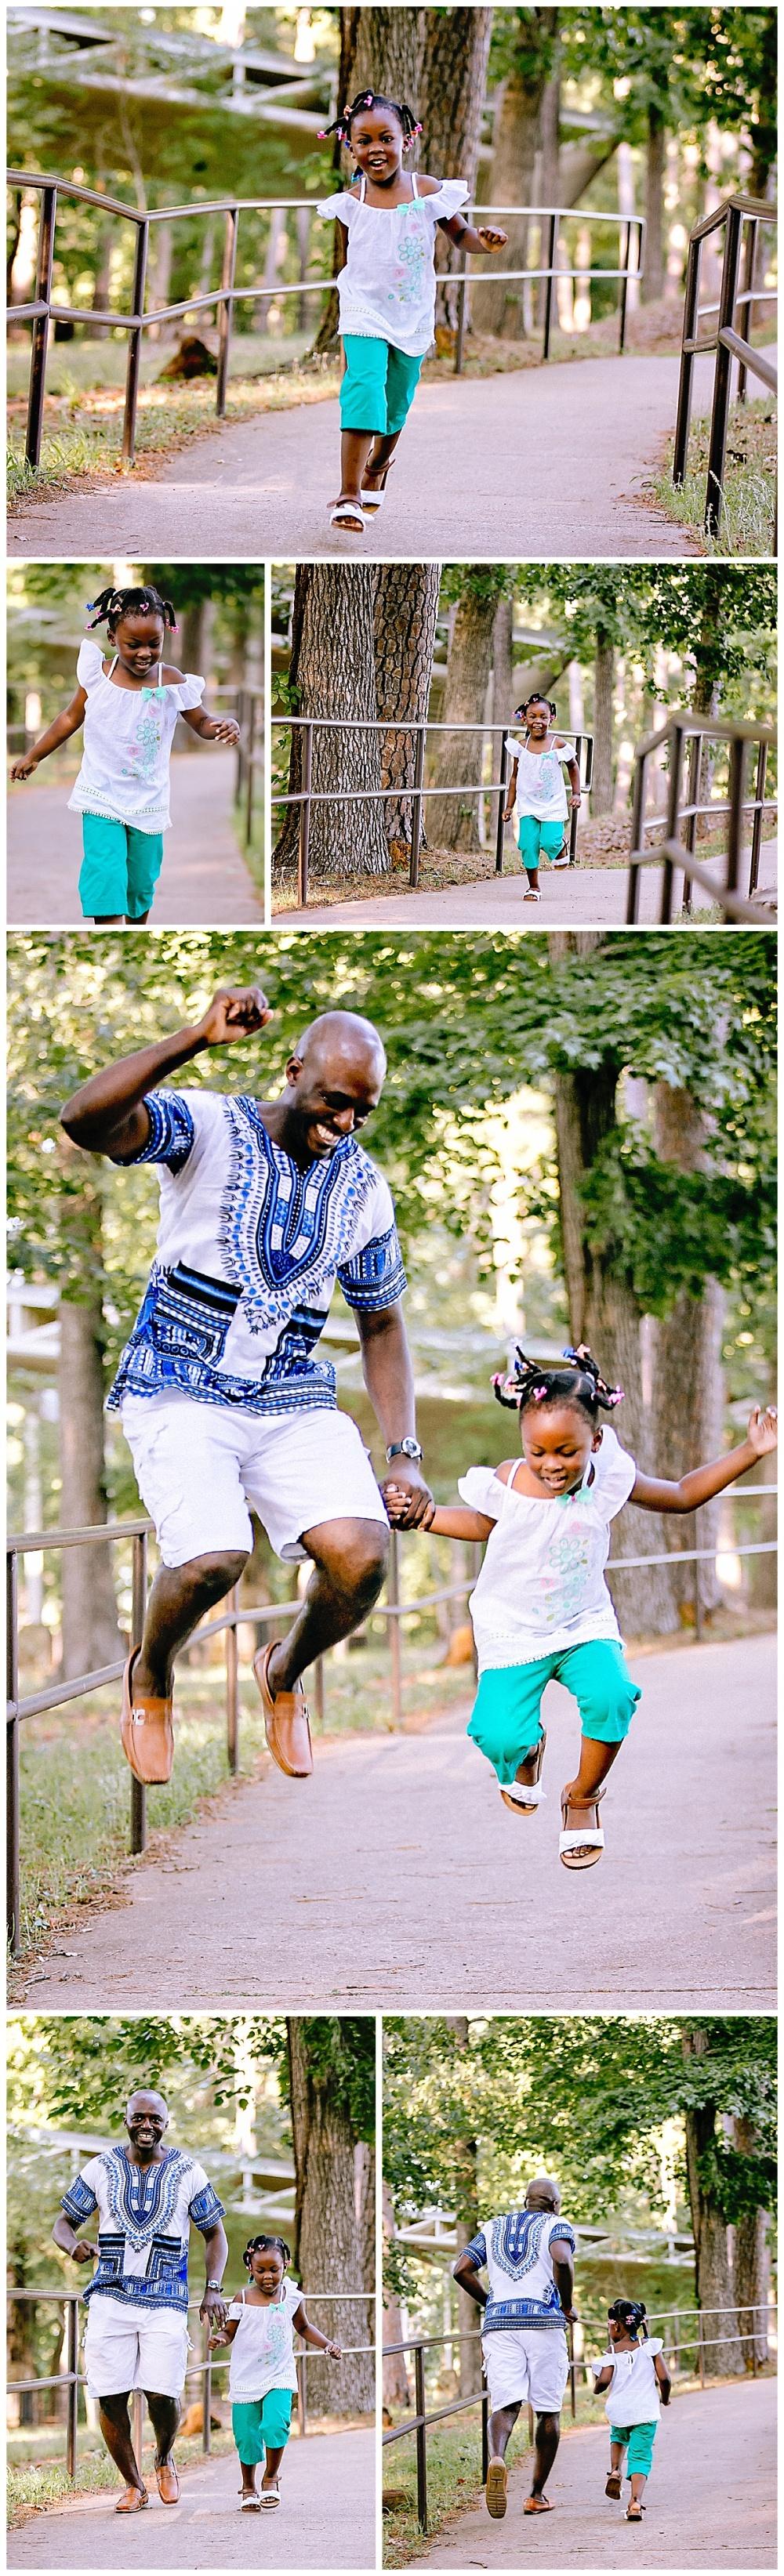 Carly-Barton-Photography-Family-Session-Kilgore-Texas-Twins-1-year-birthday-cake-smash-Olowo-family-photos_0035.jpg